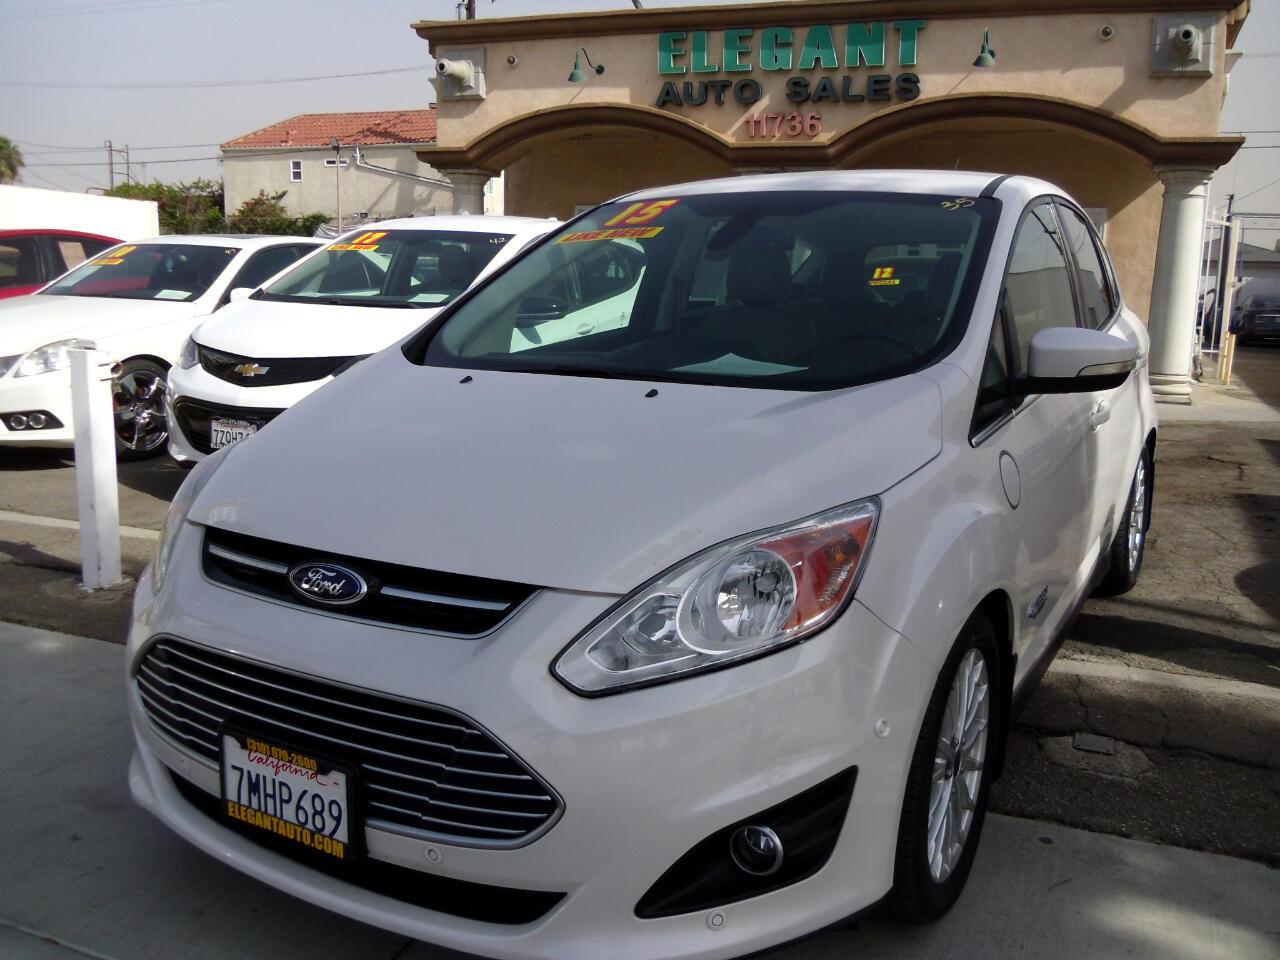 Ford C-Max Energi 5dr HB SEL 2015